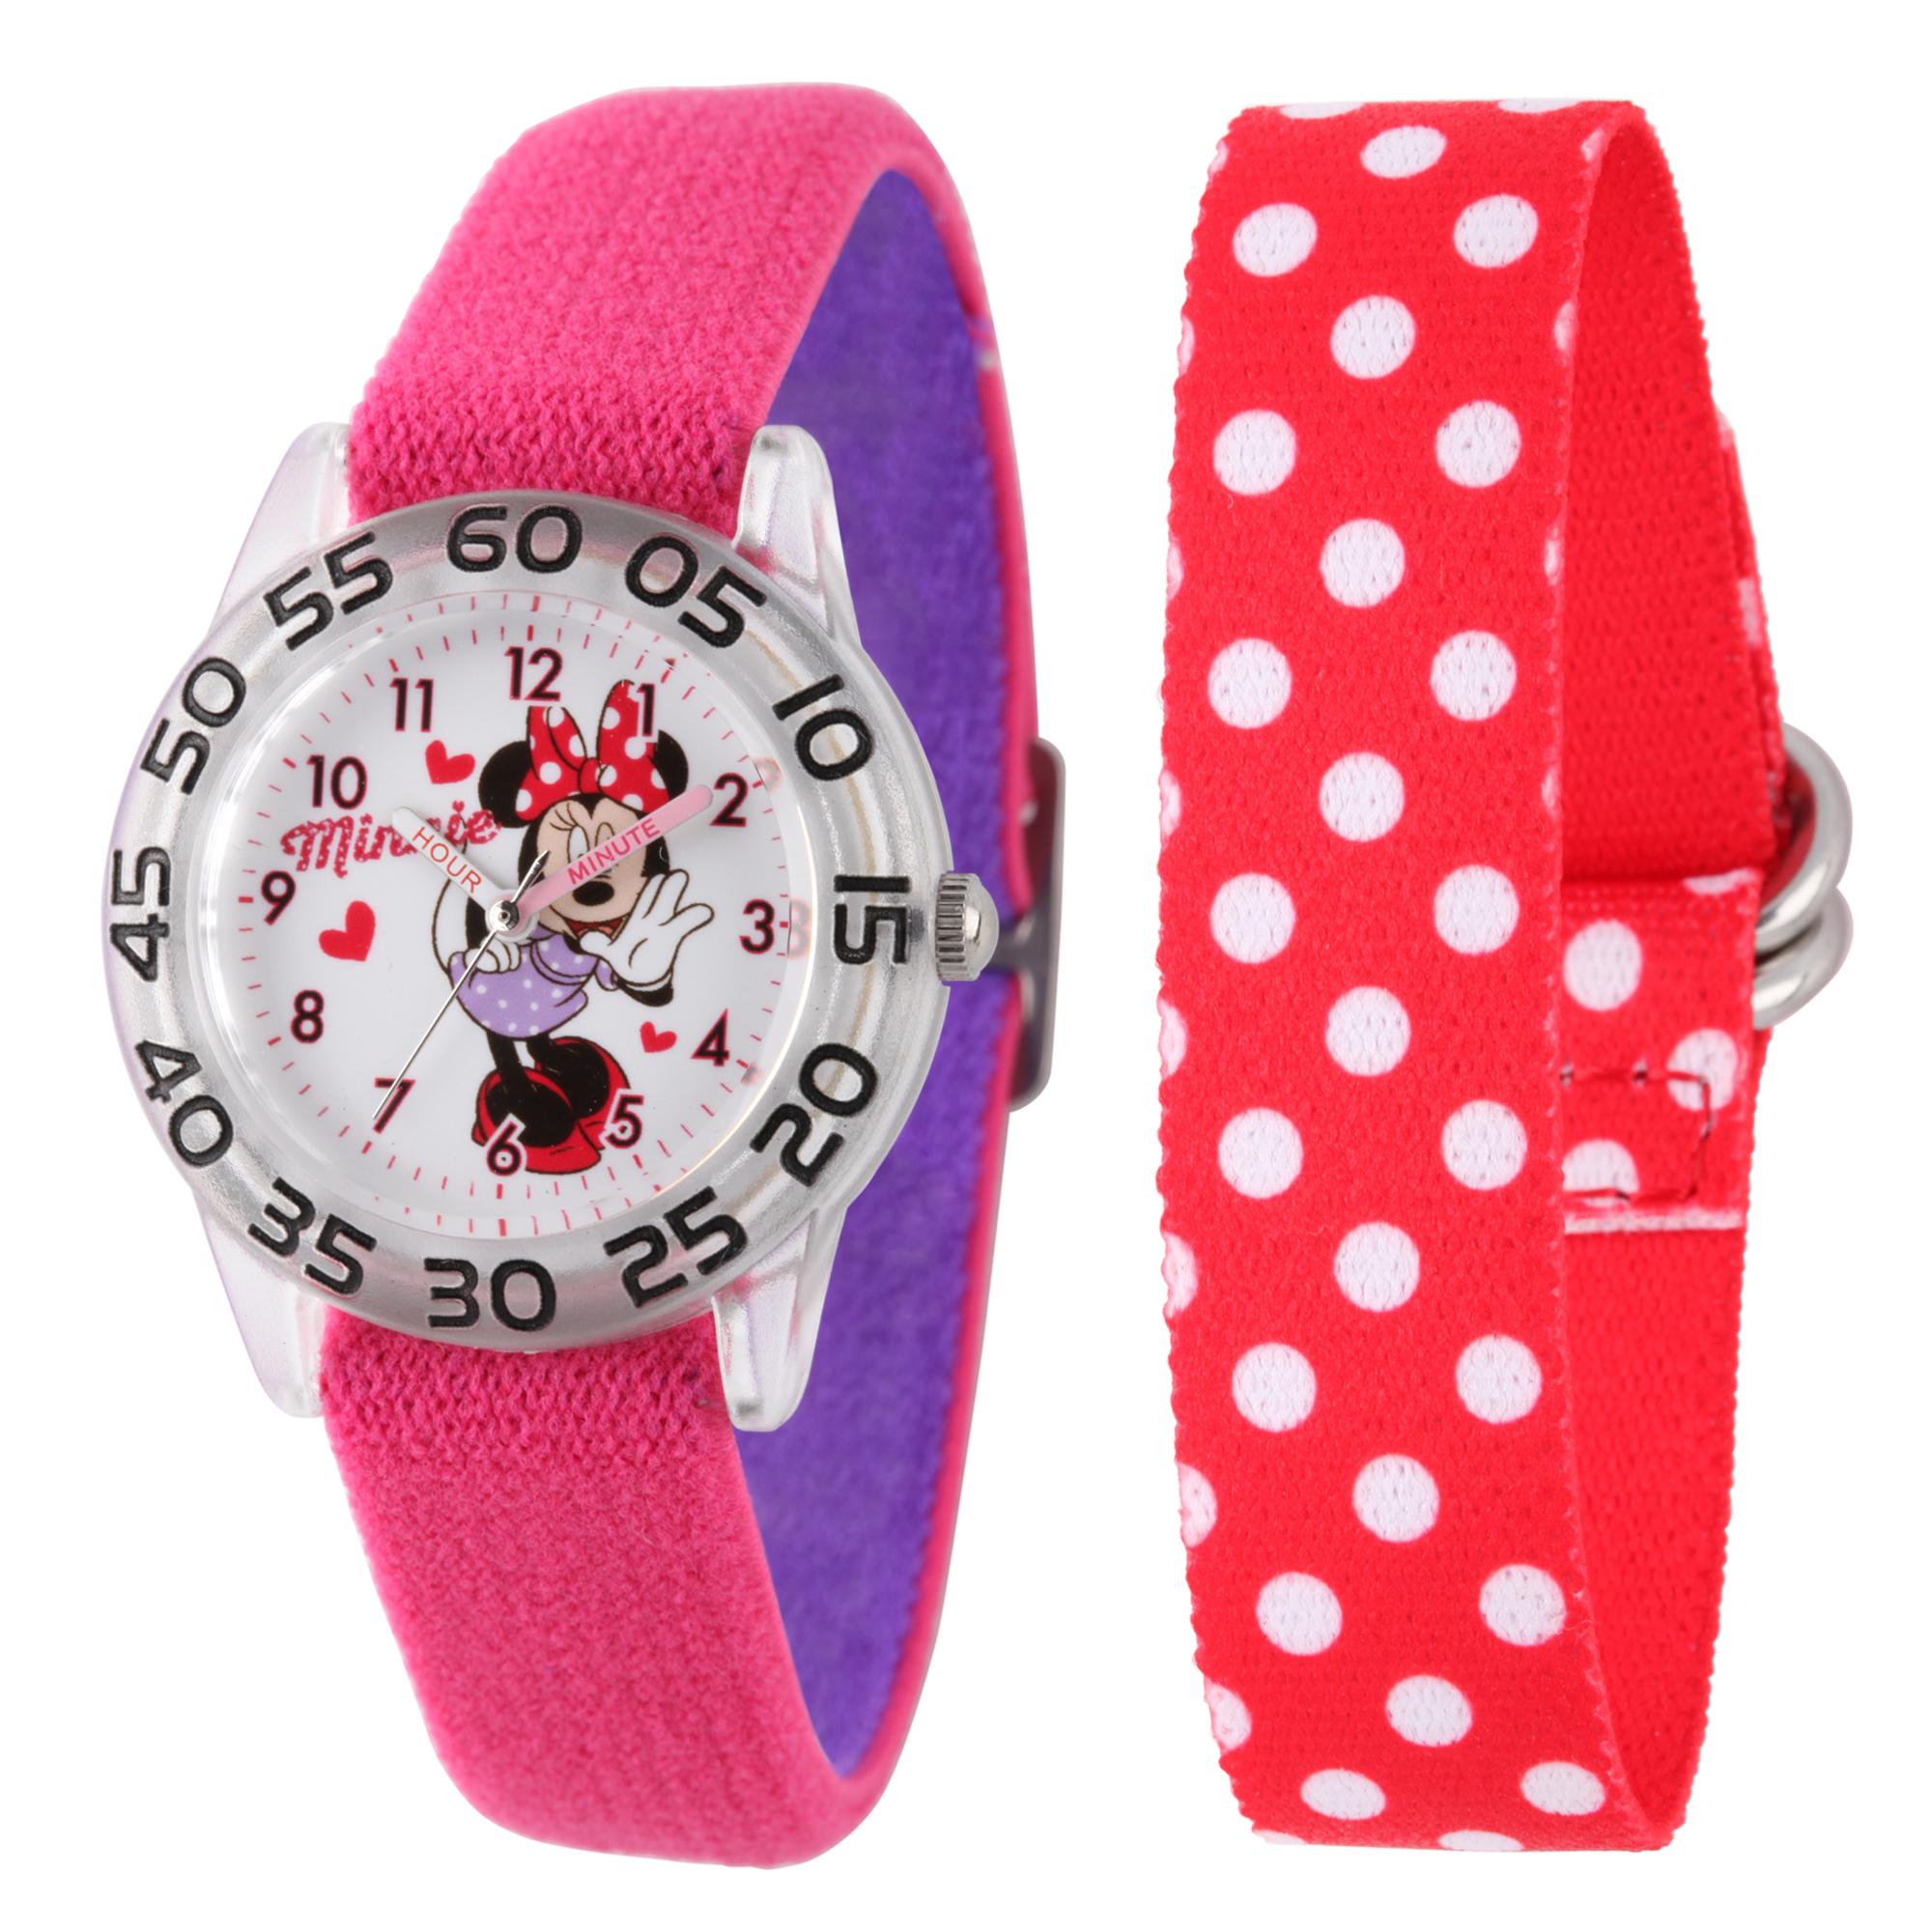 Minnie Mouse Girls' Plastic Time Teacher Interchangeable Strap Watch, Red Nylon Strap & Double Color Pink w/Purple Elastic Nylon Strap